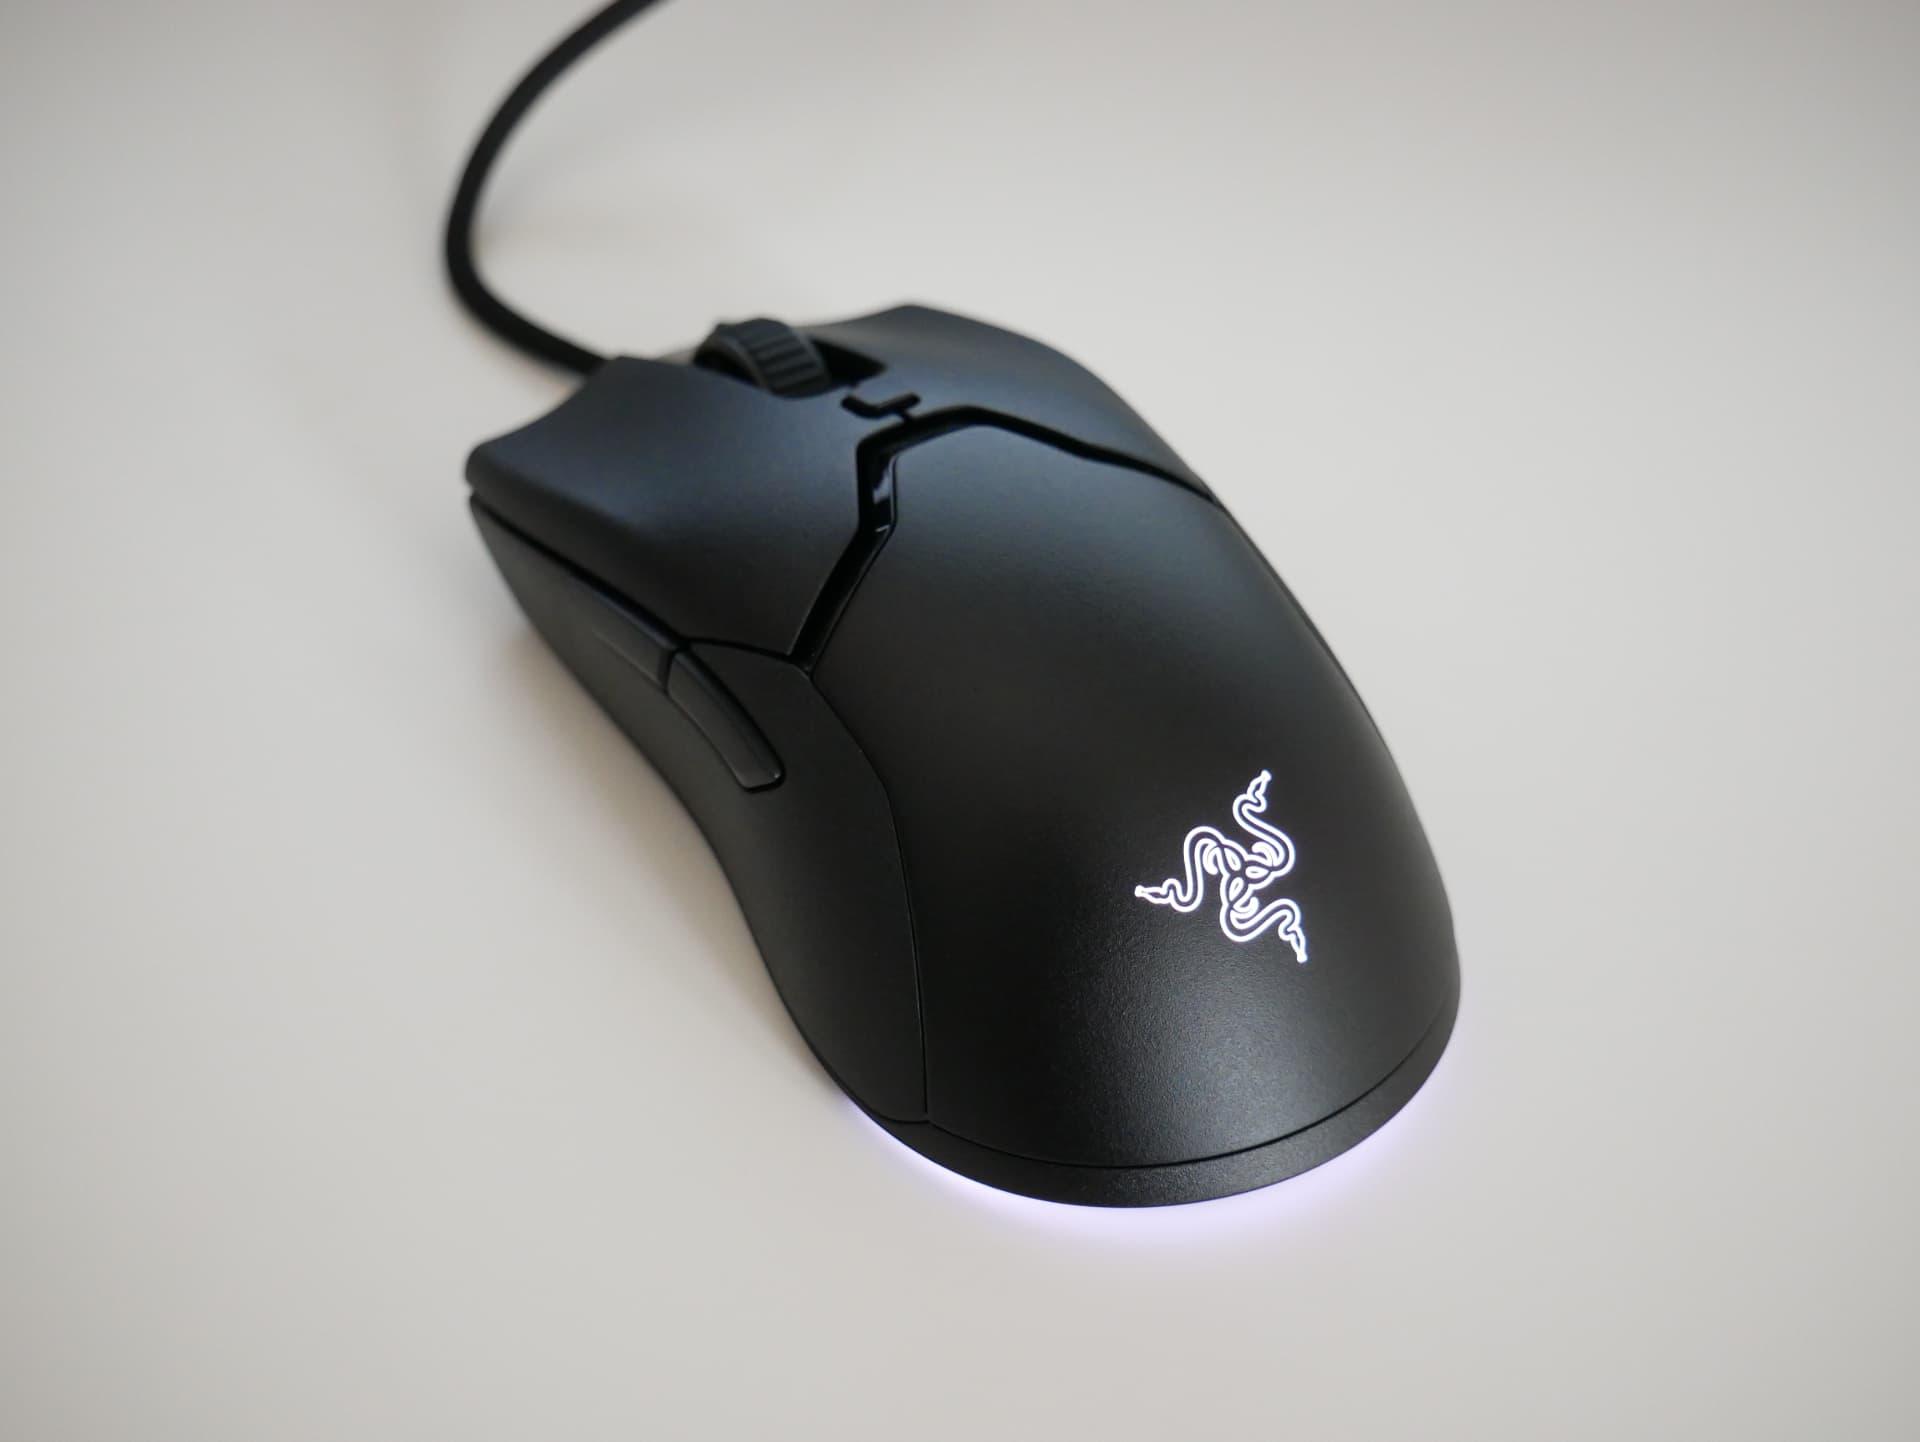 「Razer Viper Mini」レビュー。ありそうで無かった形状の小型軽量ゲーミングマウス